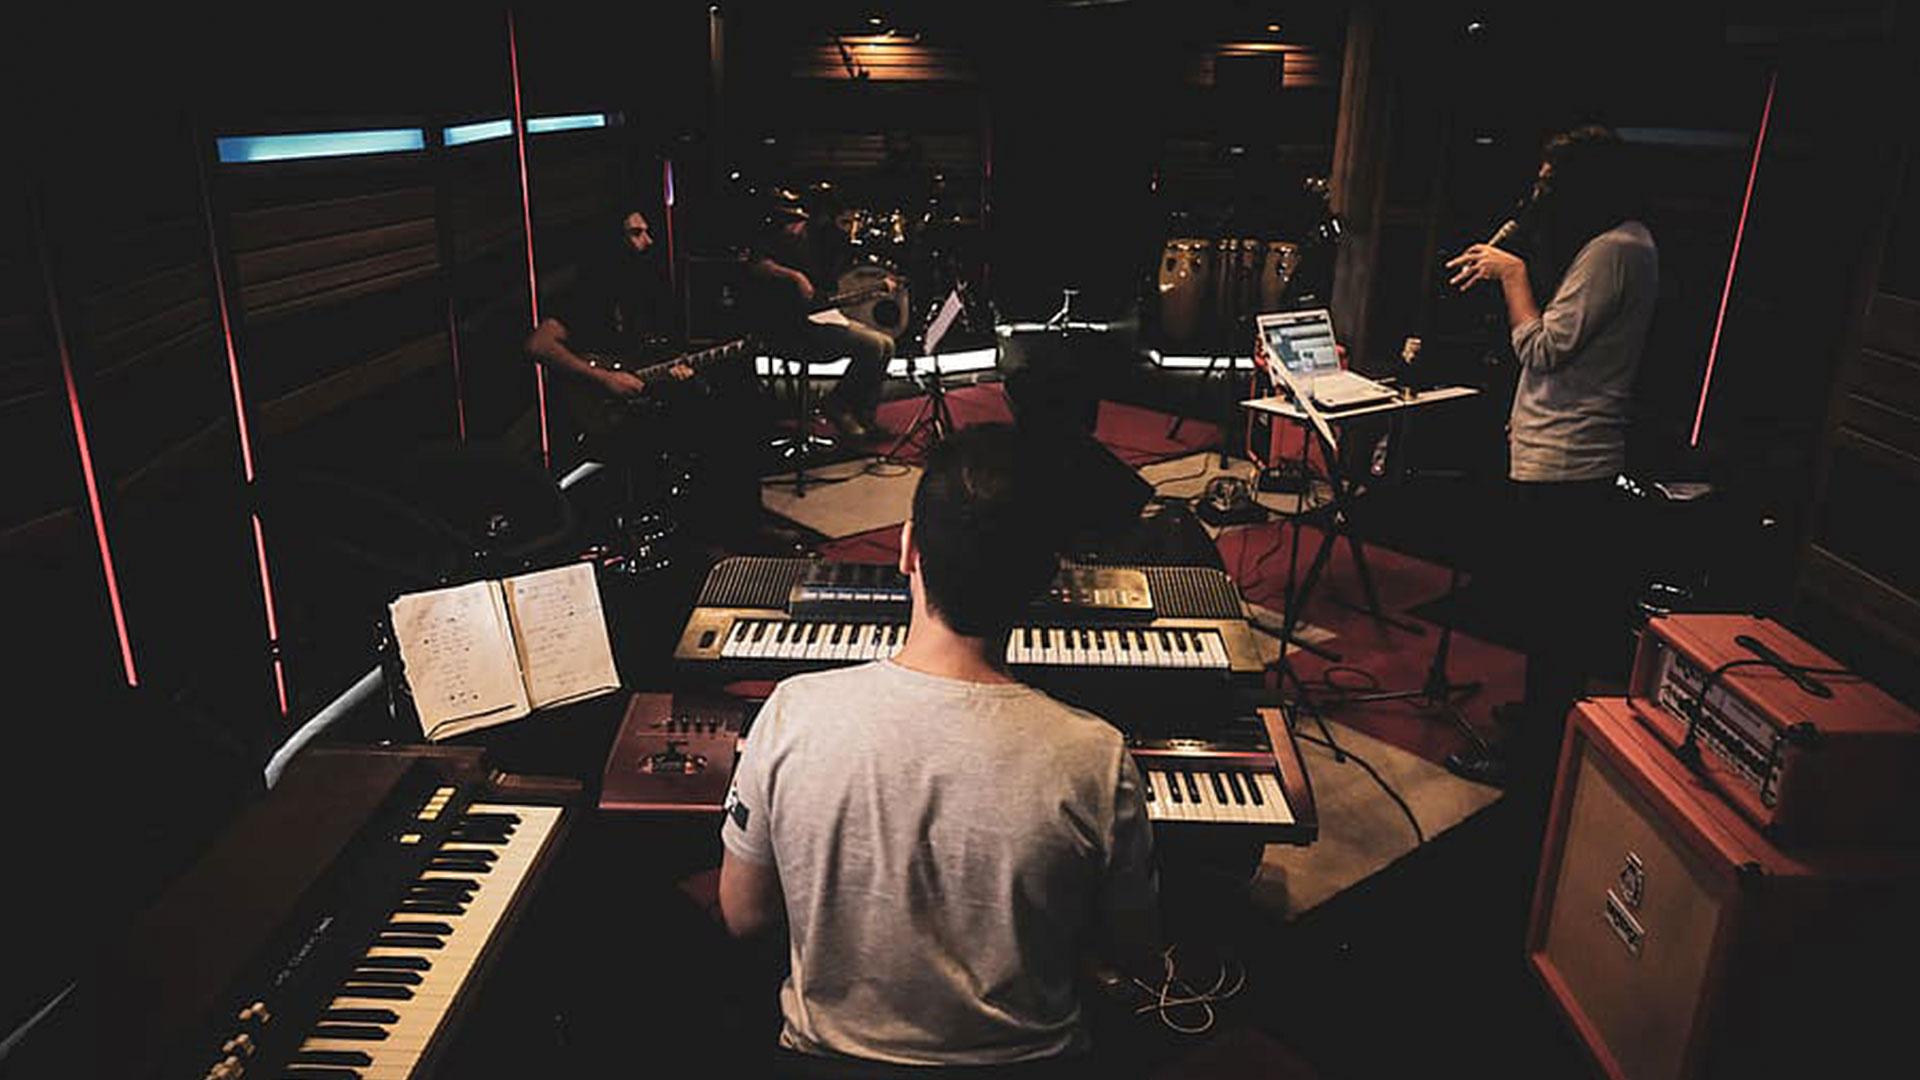 music-composing-process